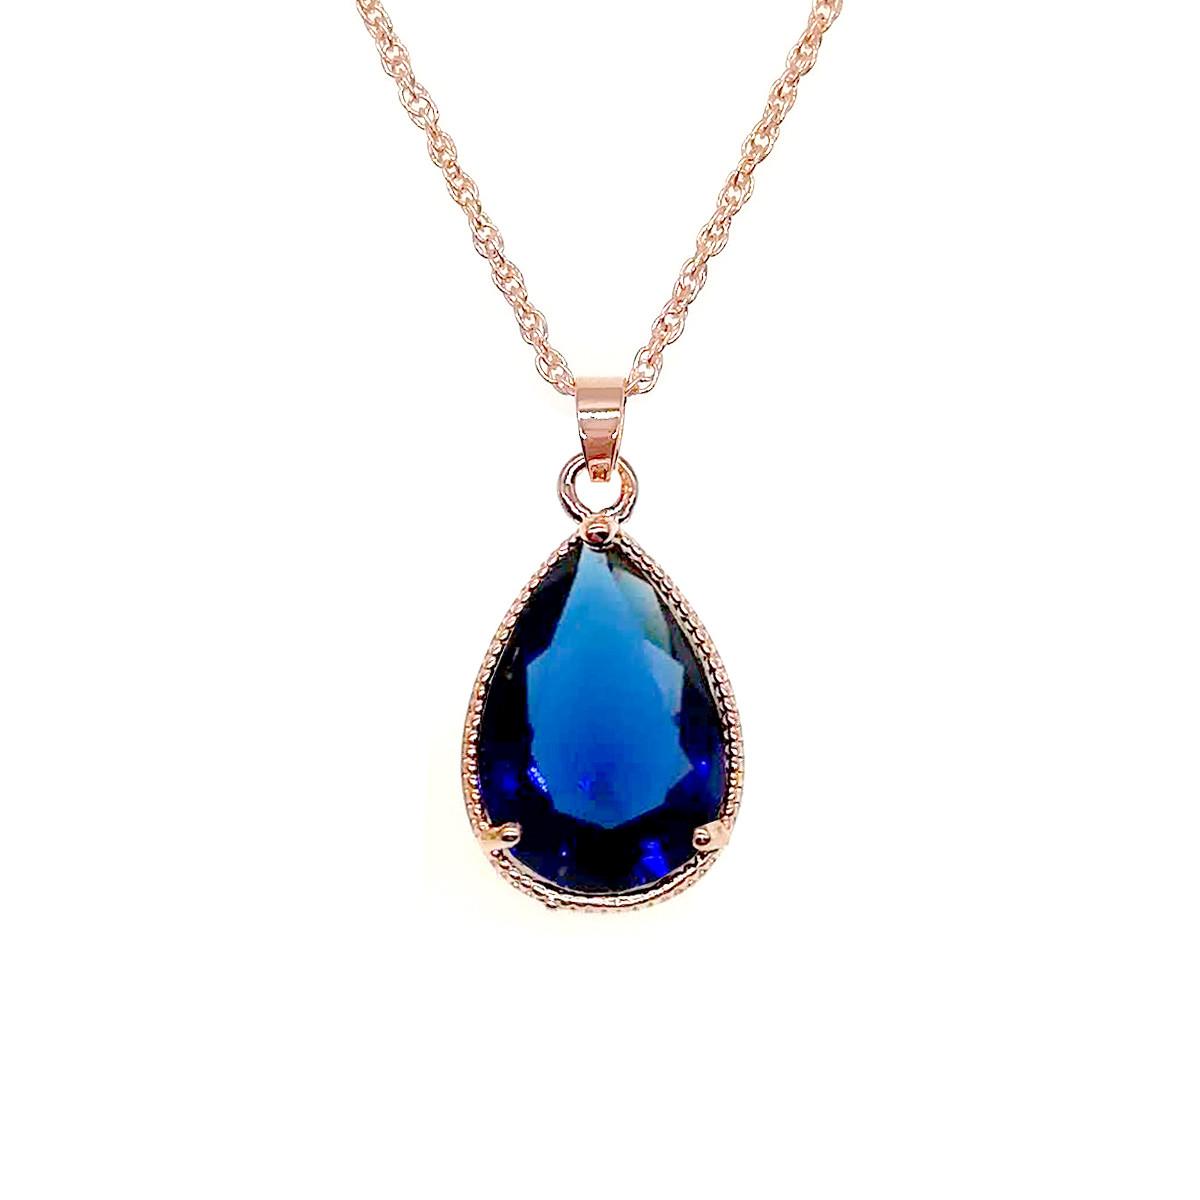 Подвеска на цепочке SONATA, из медицинского золота, синий фианит, позолота PO, 42354